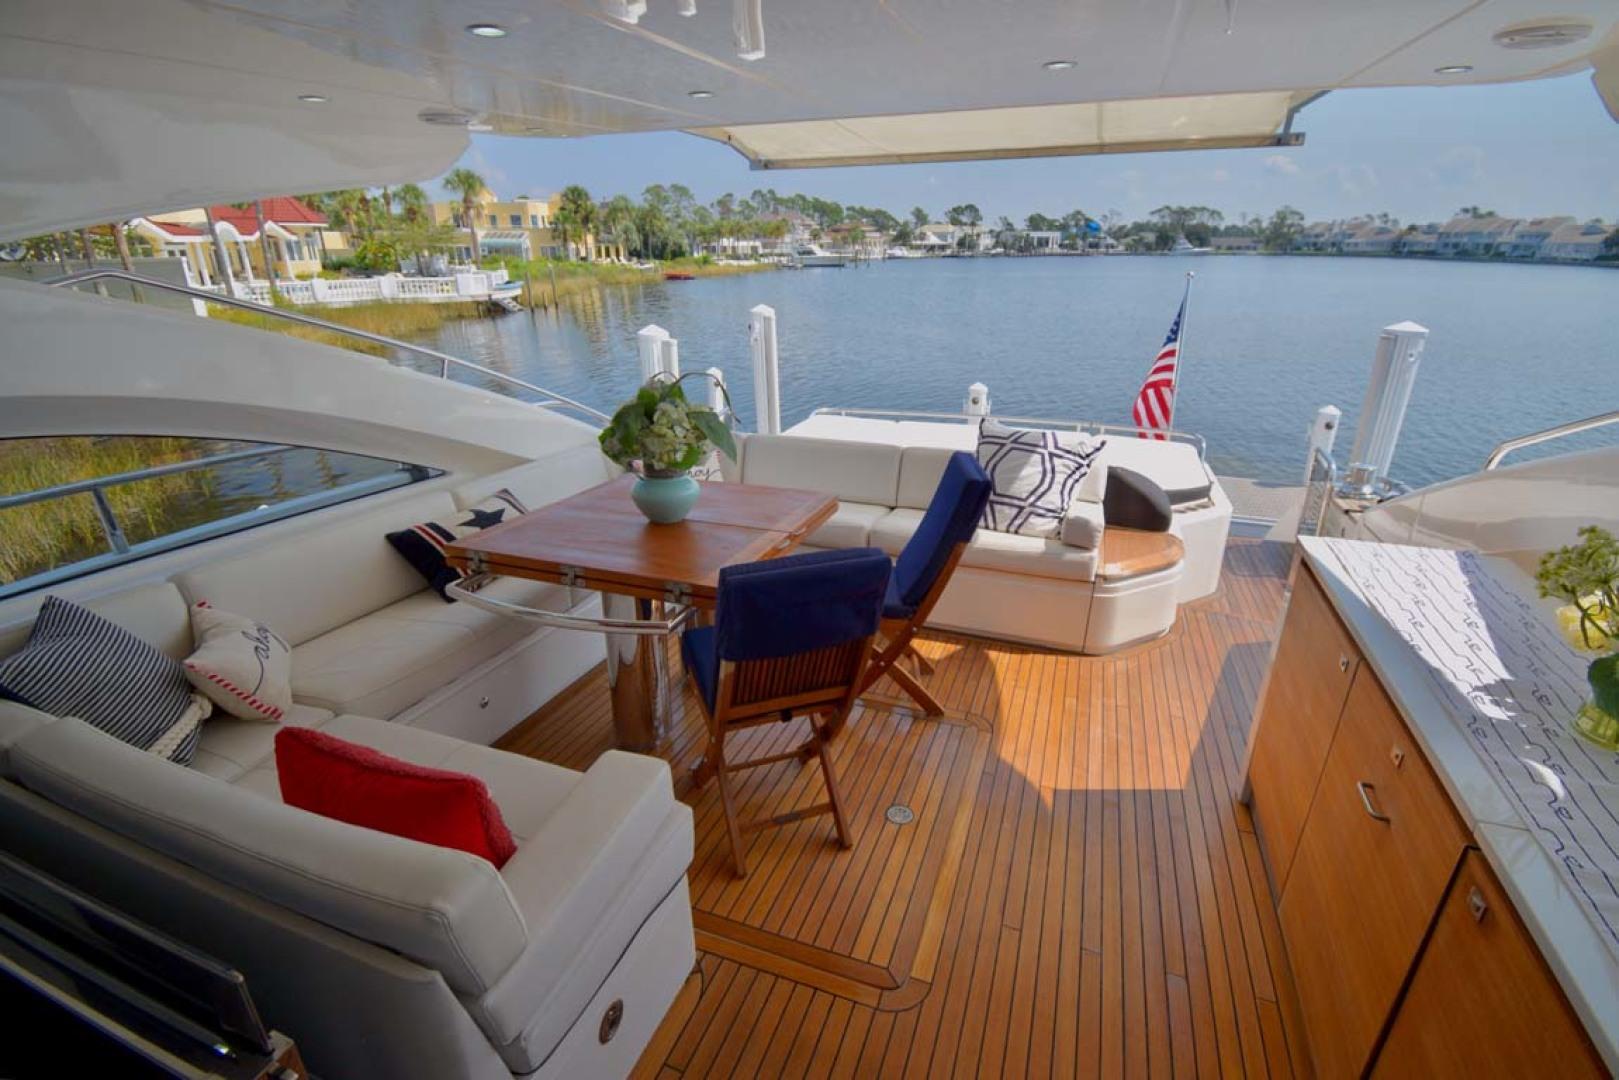 Princess-V72 2013-High Bid Destin-Florida-United States-Outdoor Lounge Seating-1233095 | Thumbnail